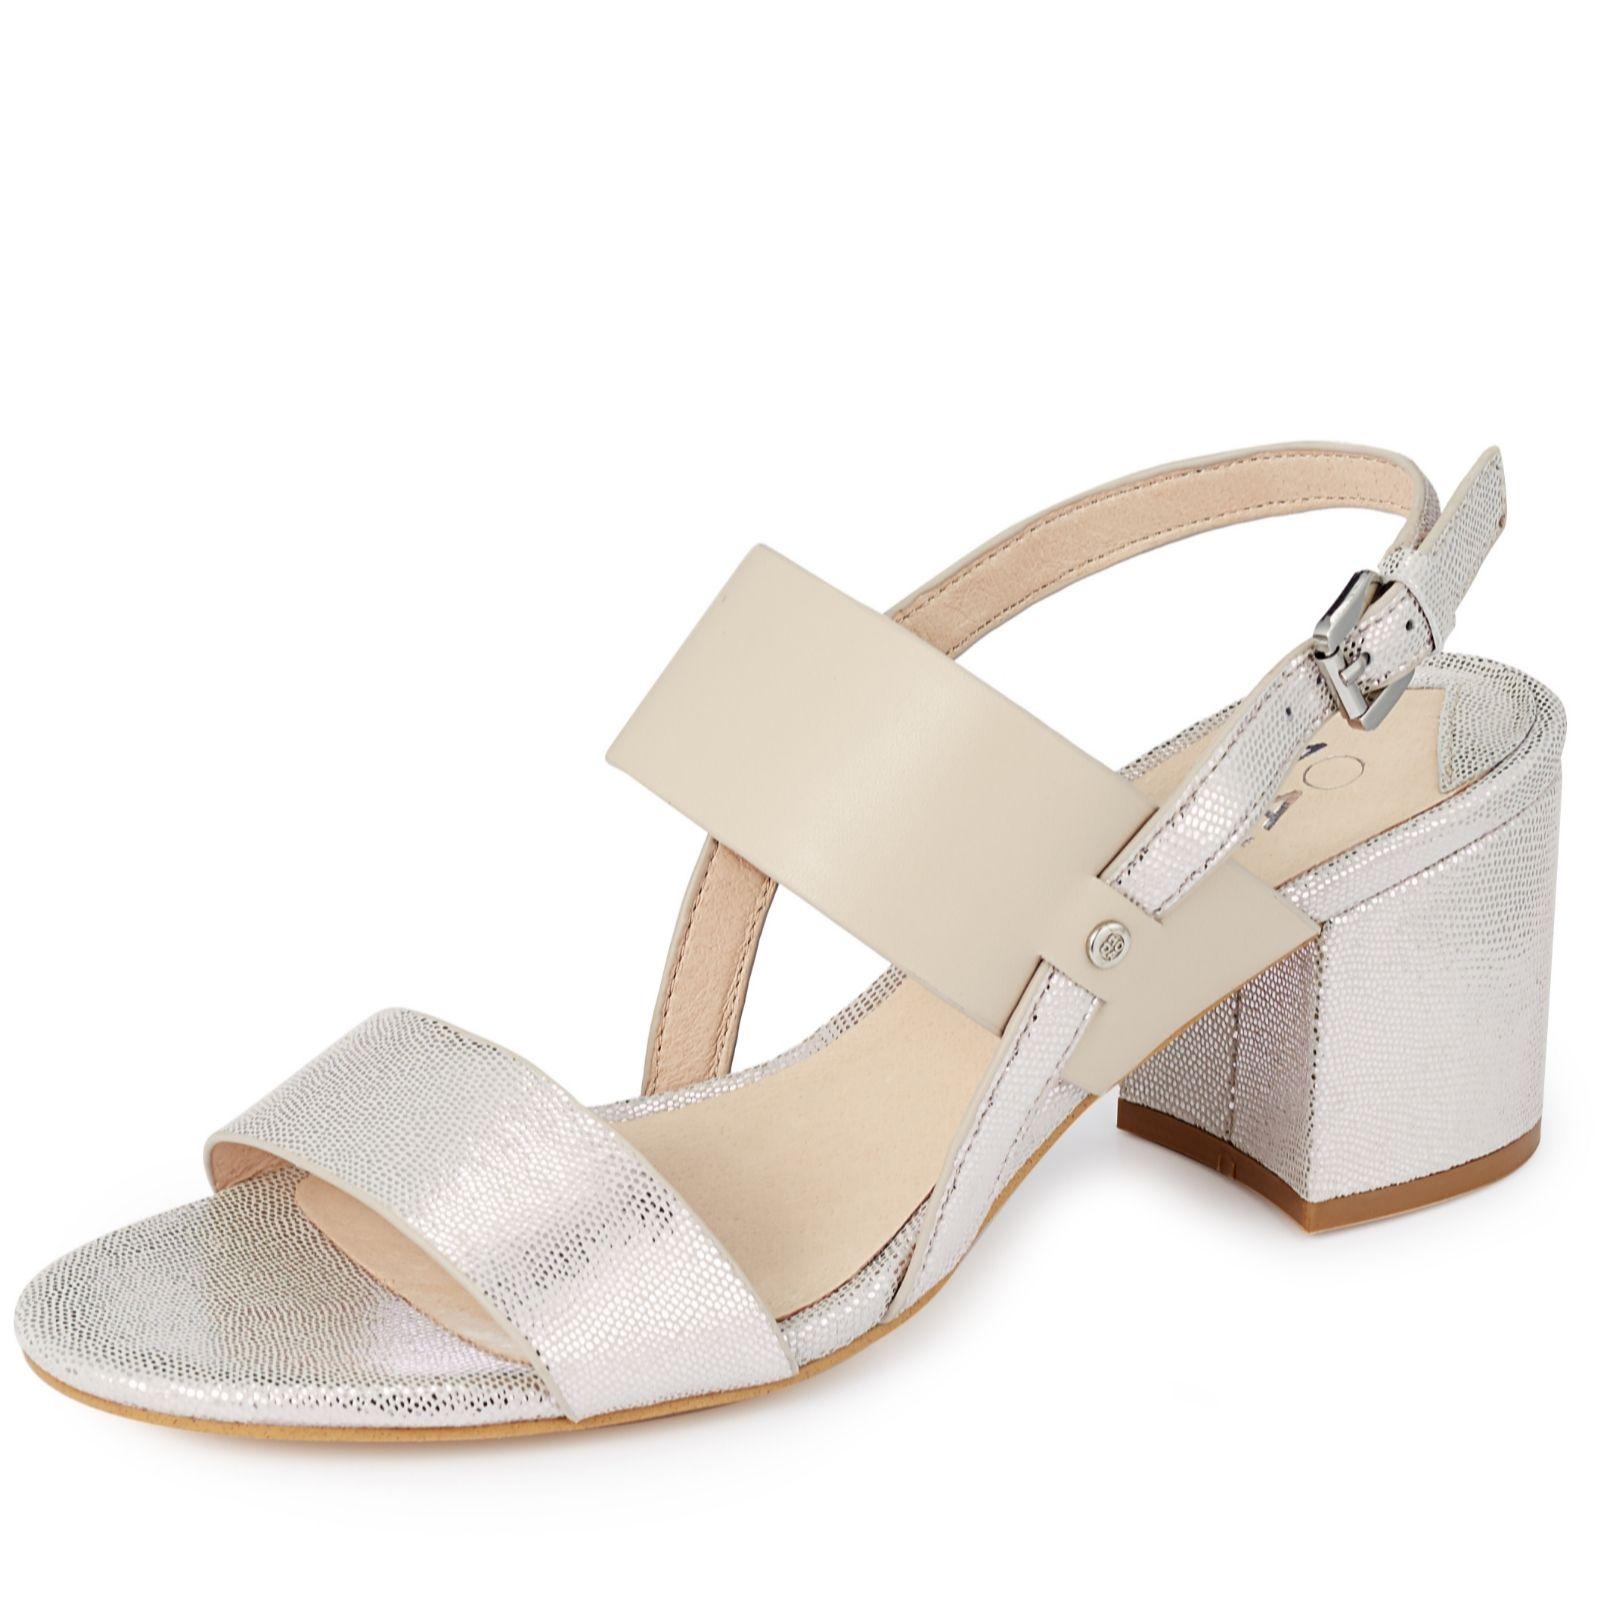 894610ddca8f1 Moda In Pelle Lodrana Block Heel Sandal - QVC UK